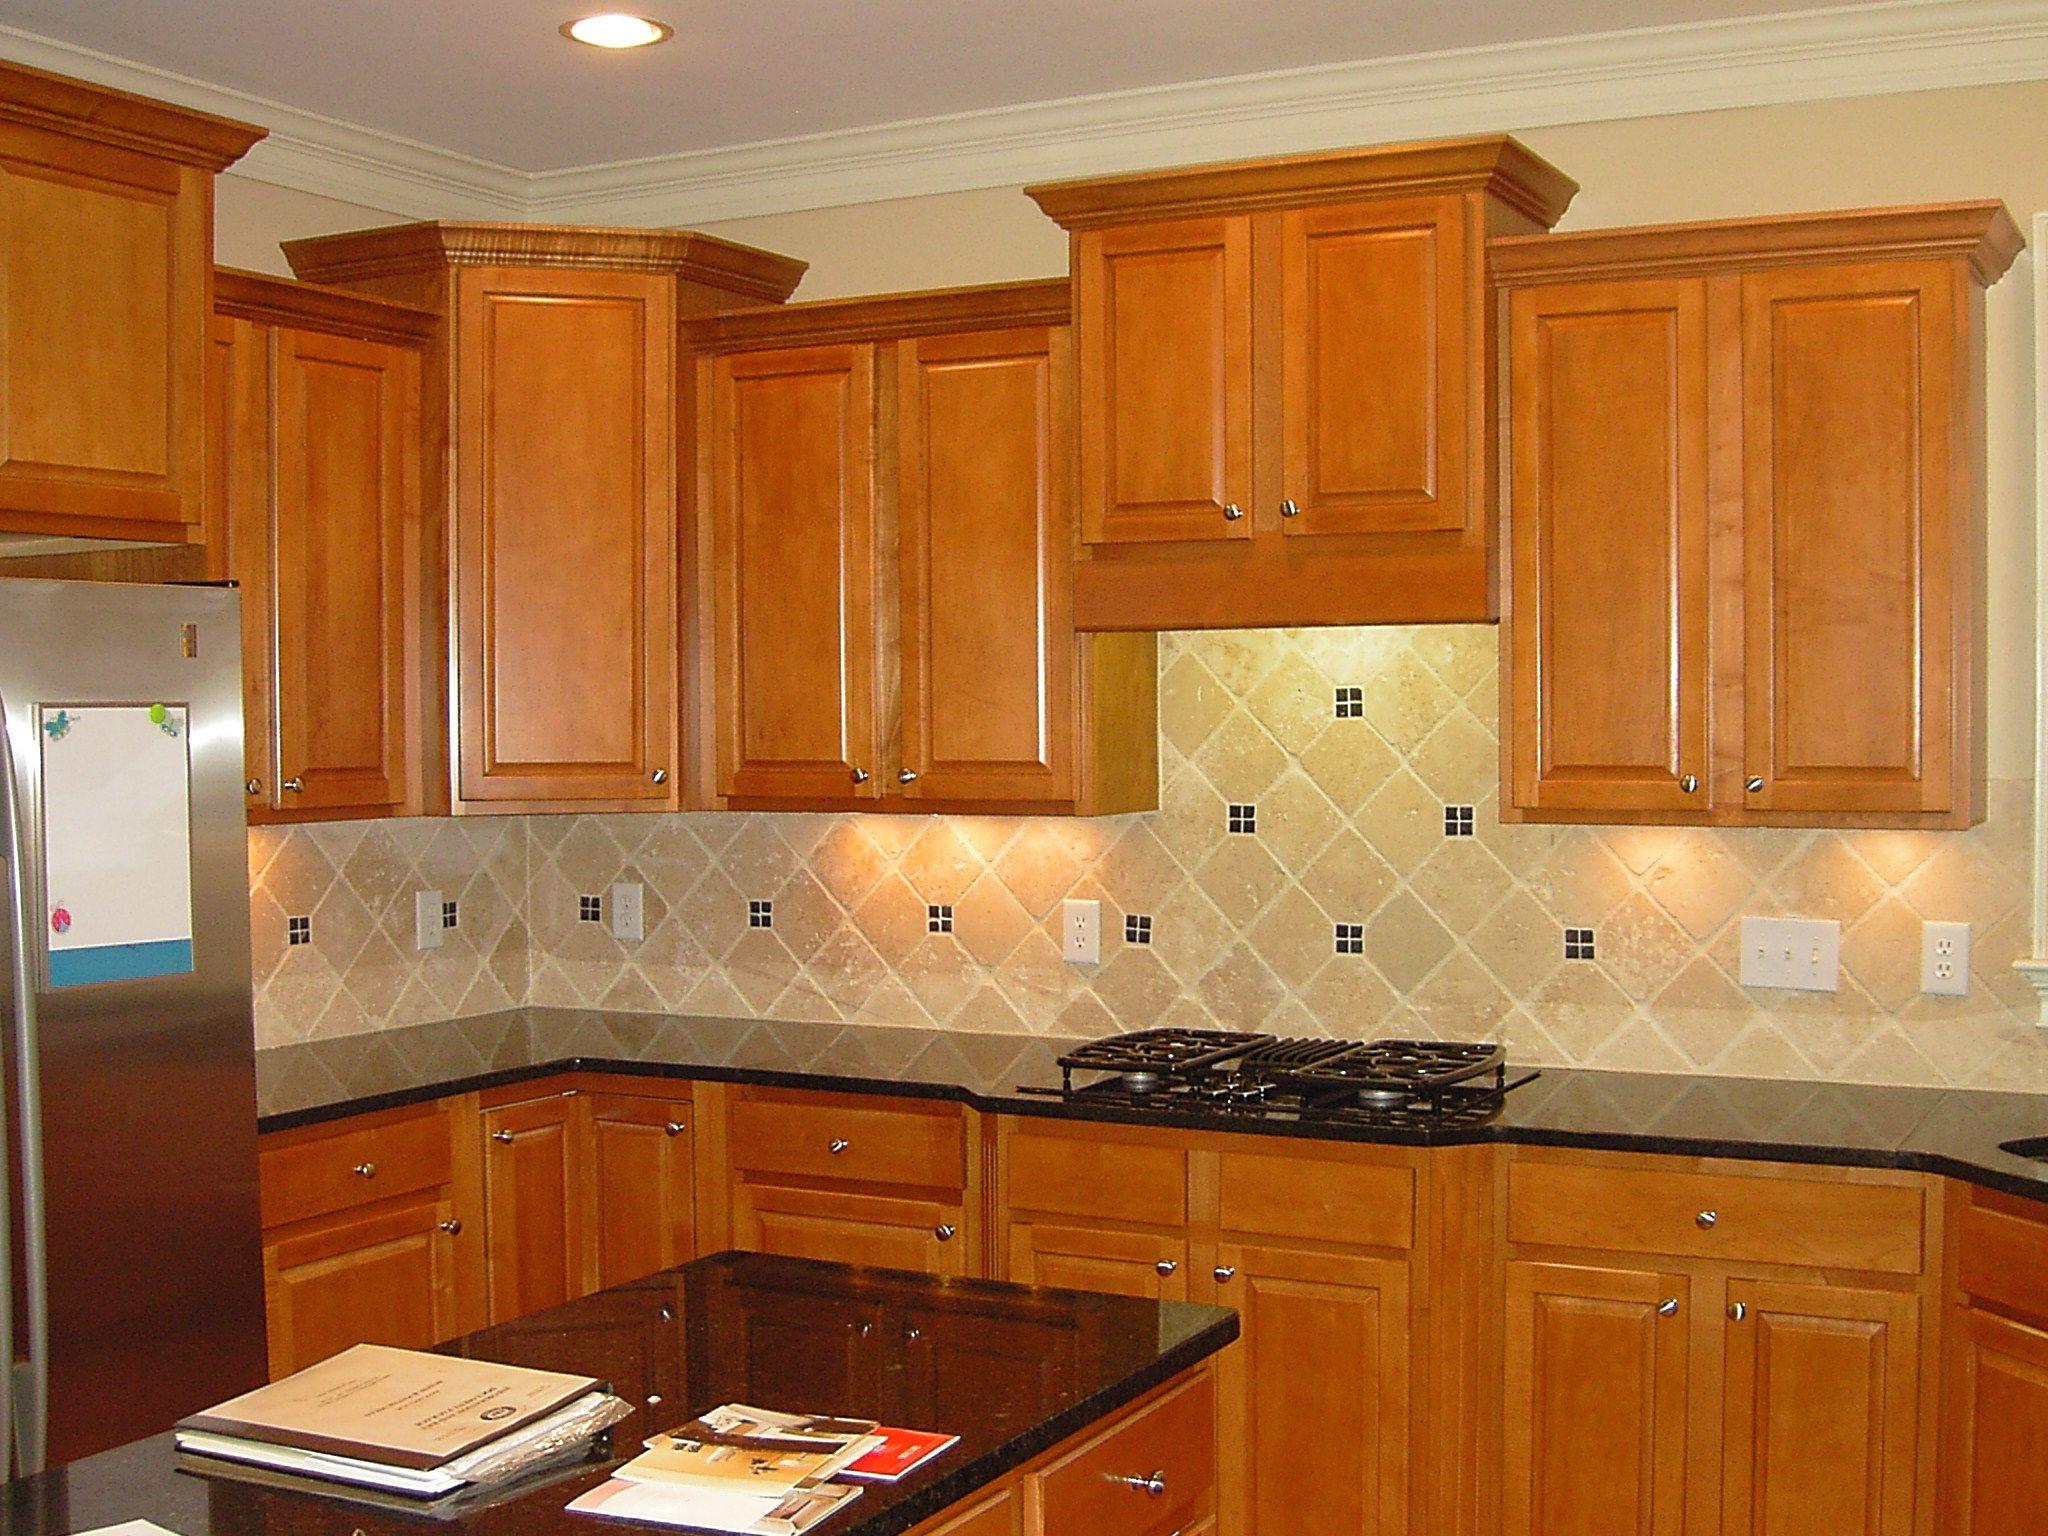 Photos gallery best kitchen cabinet refinishing ideas home design